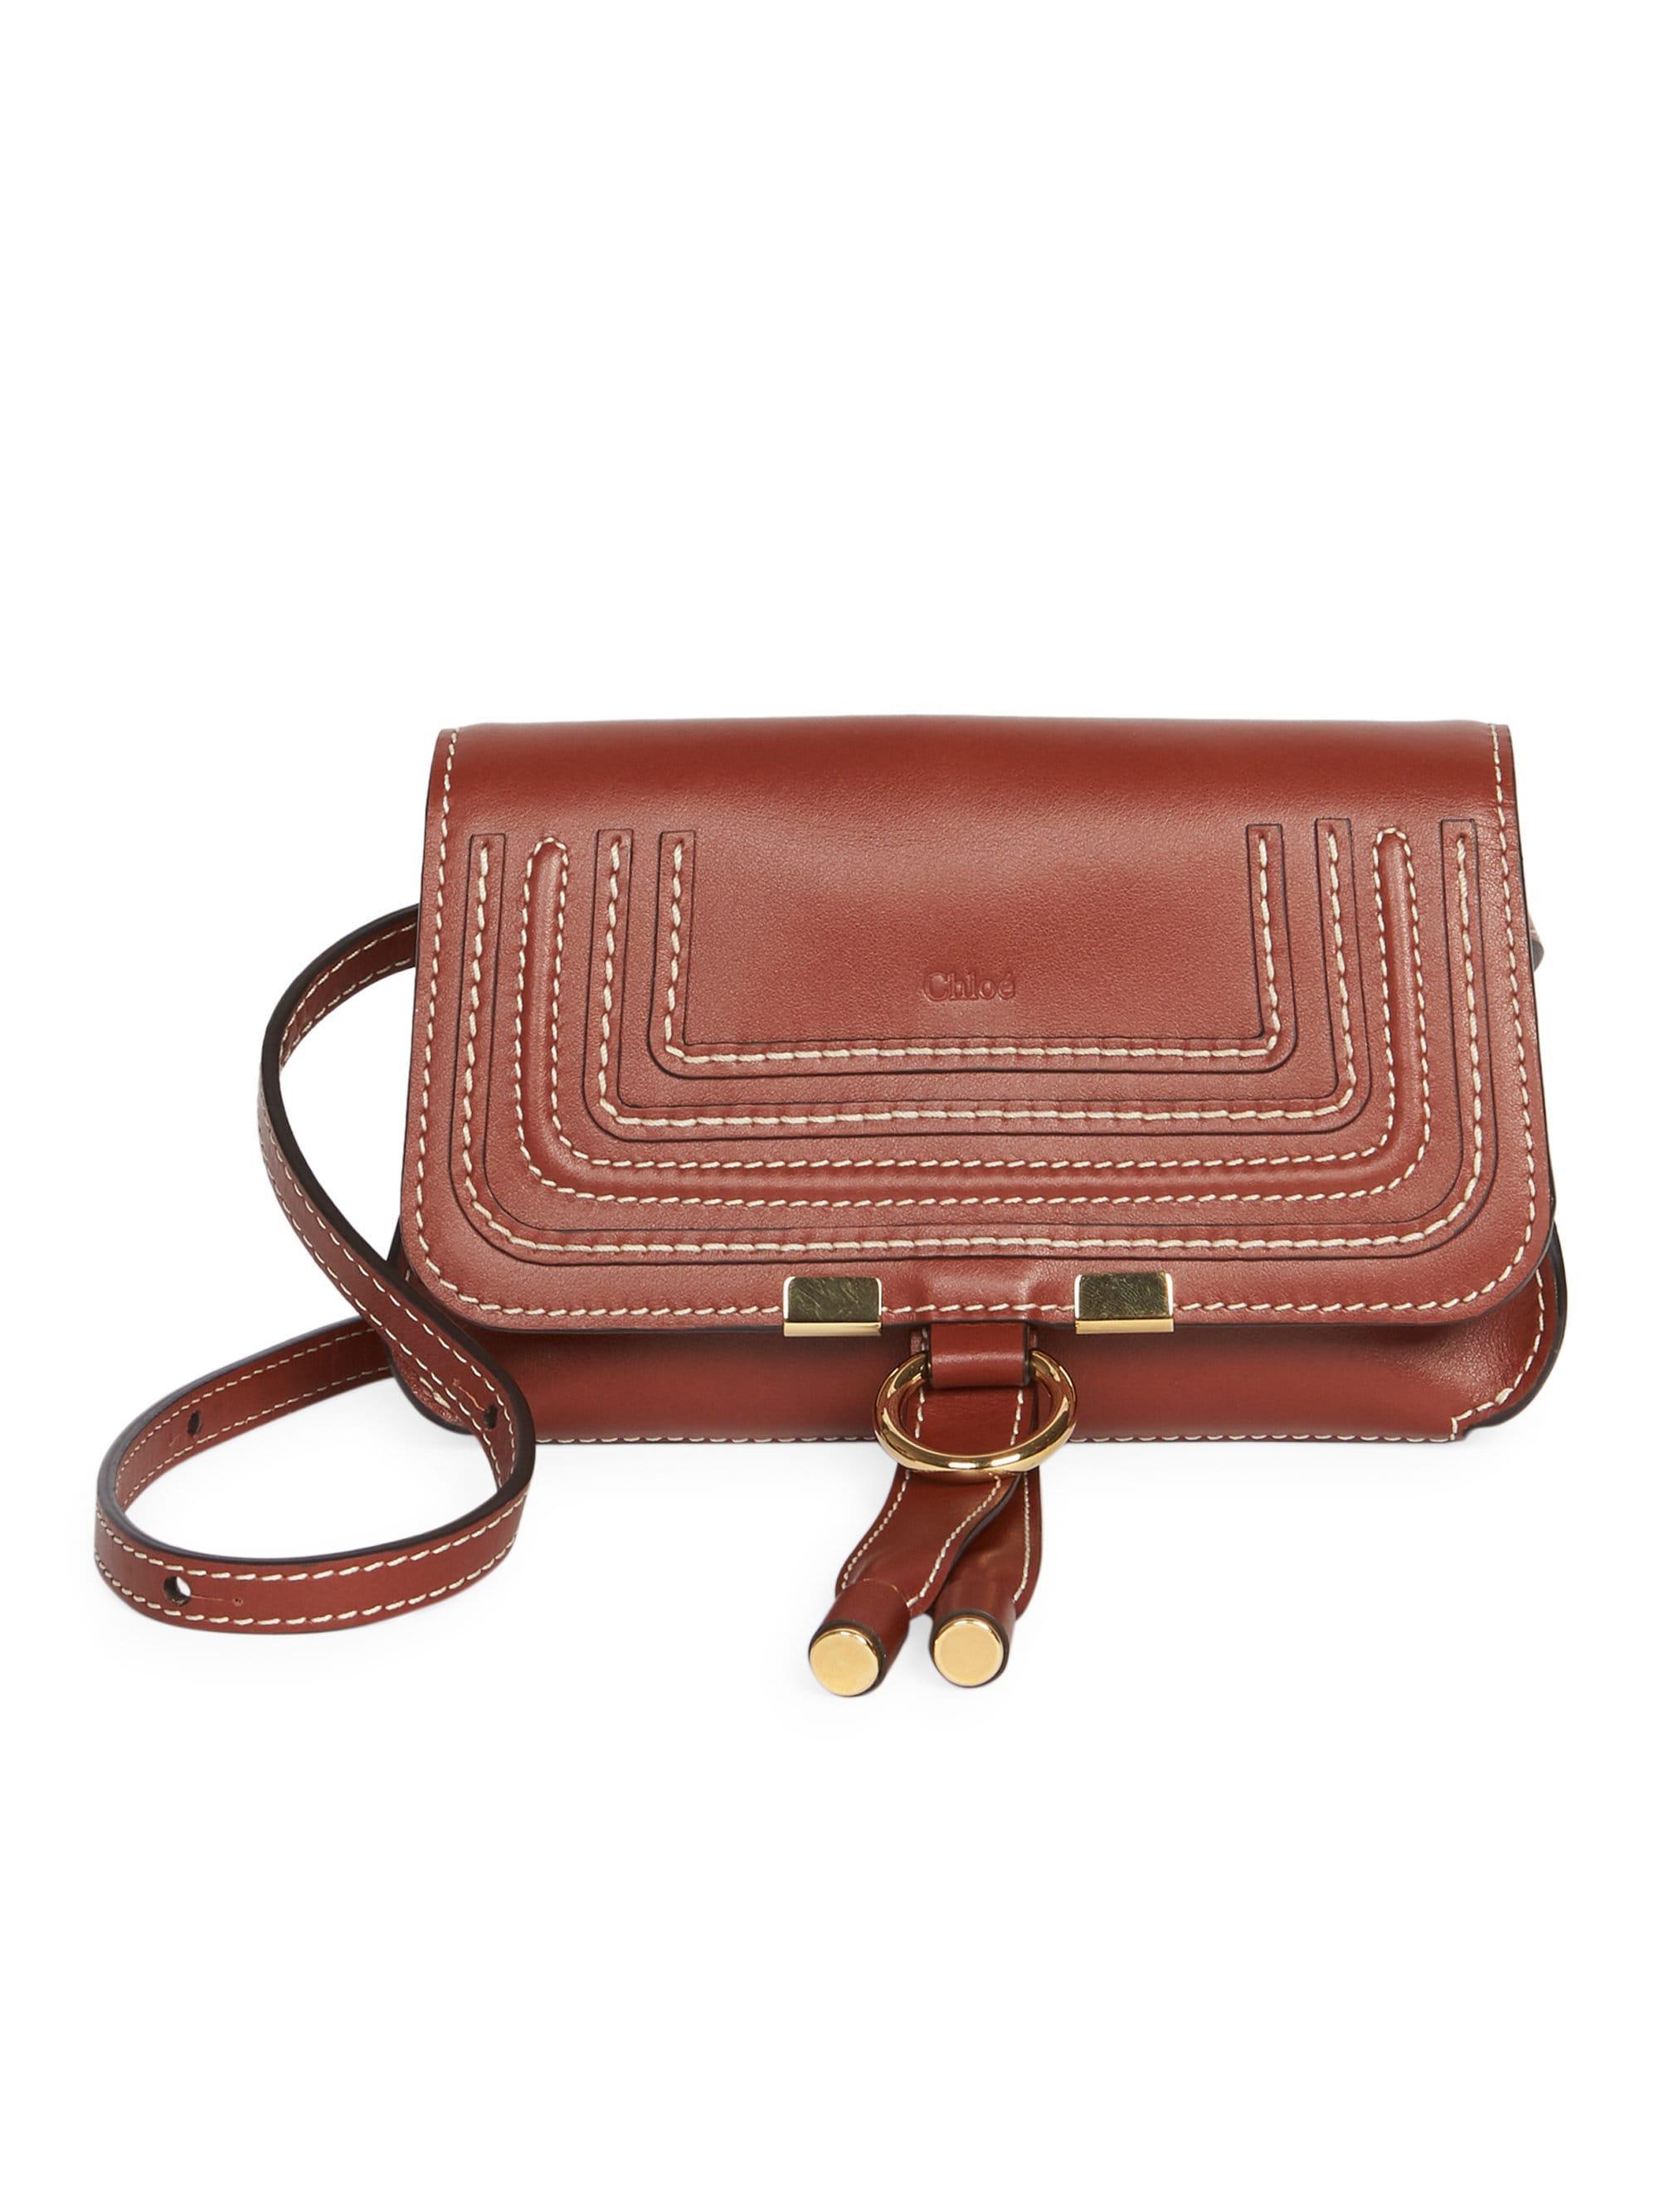 8d8a17d74359c1 Chloé Marcie Leather Belt Bag in Brown - Lyst